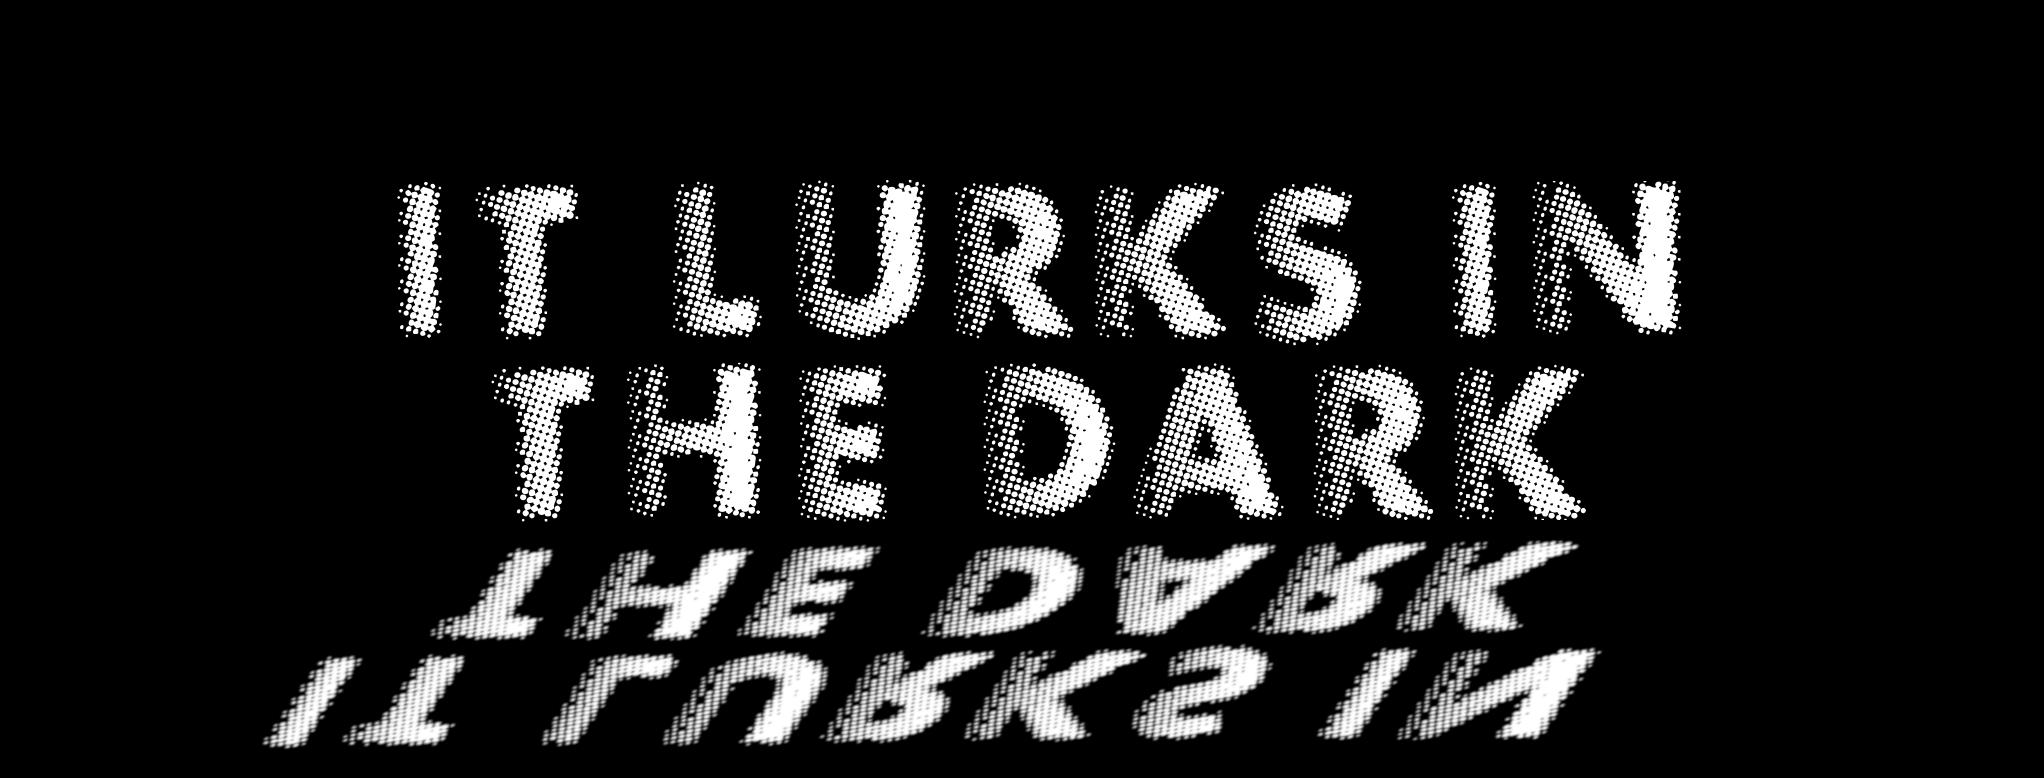 It Lurks in the Dark